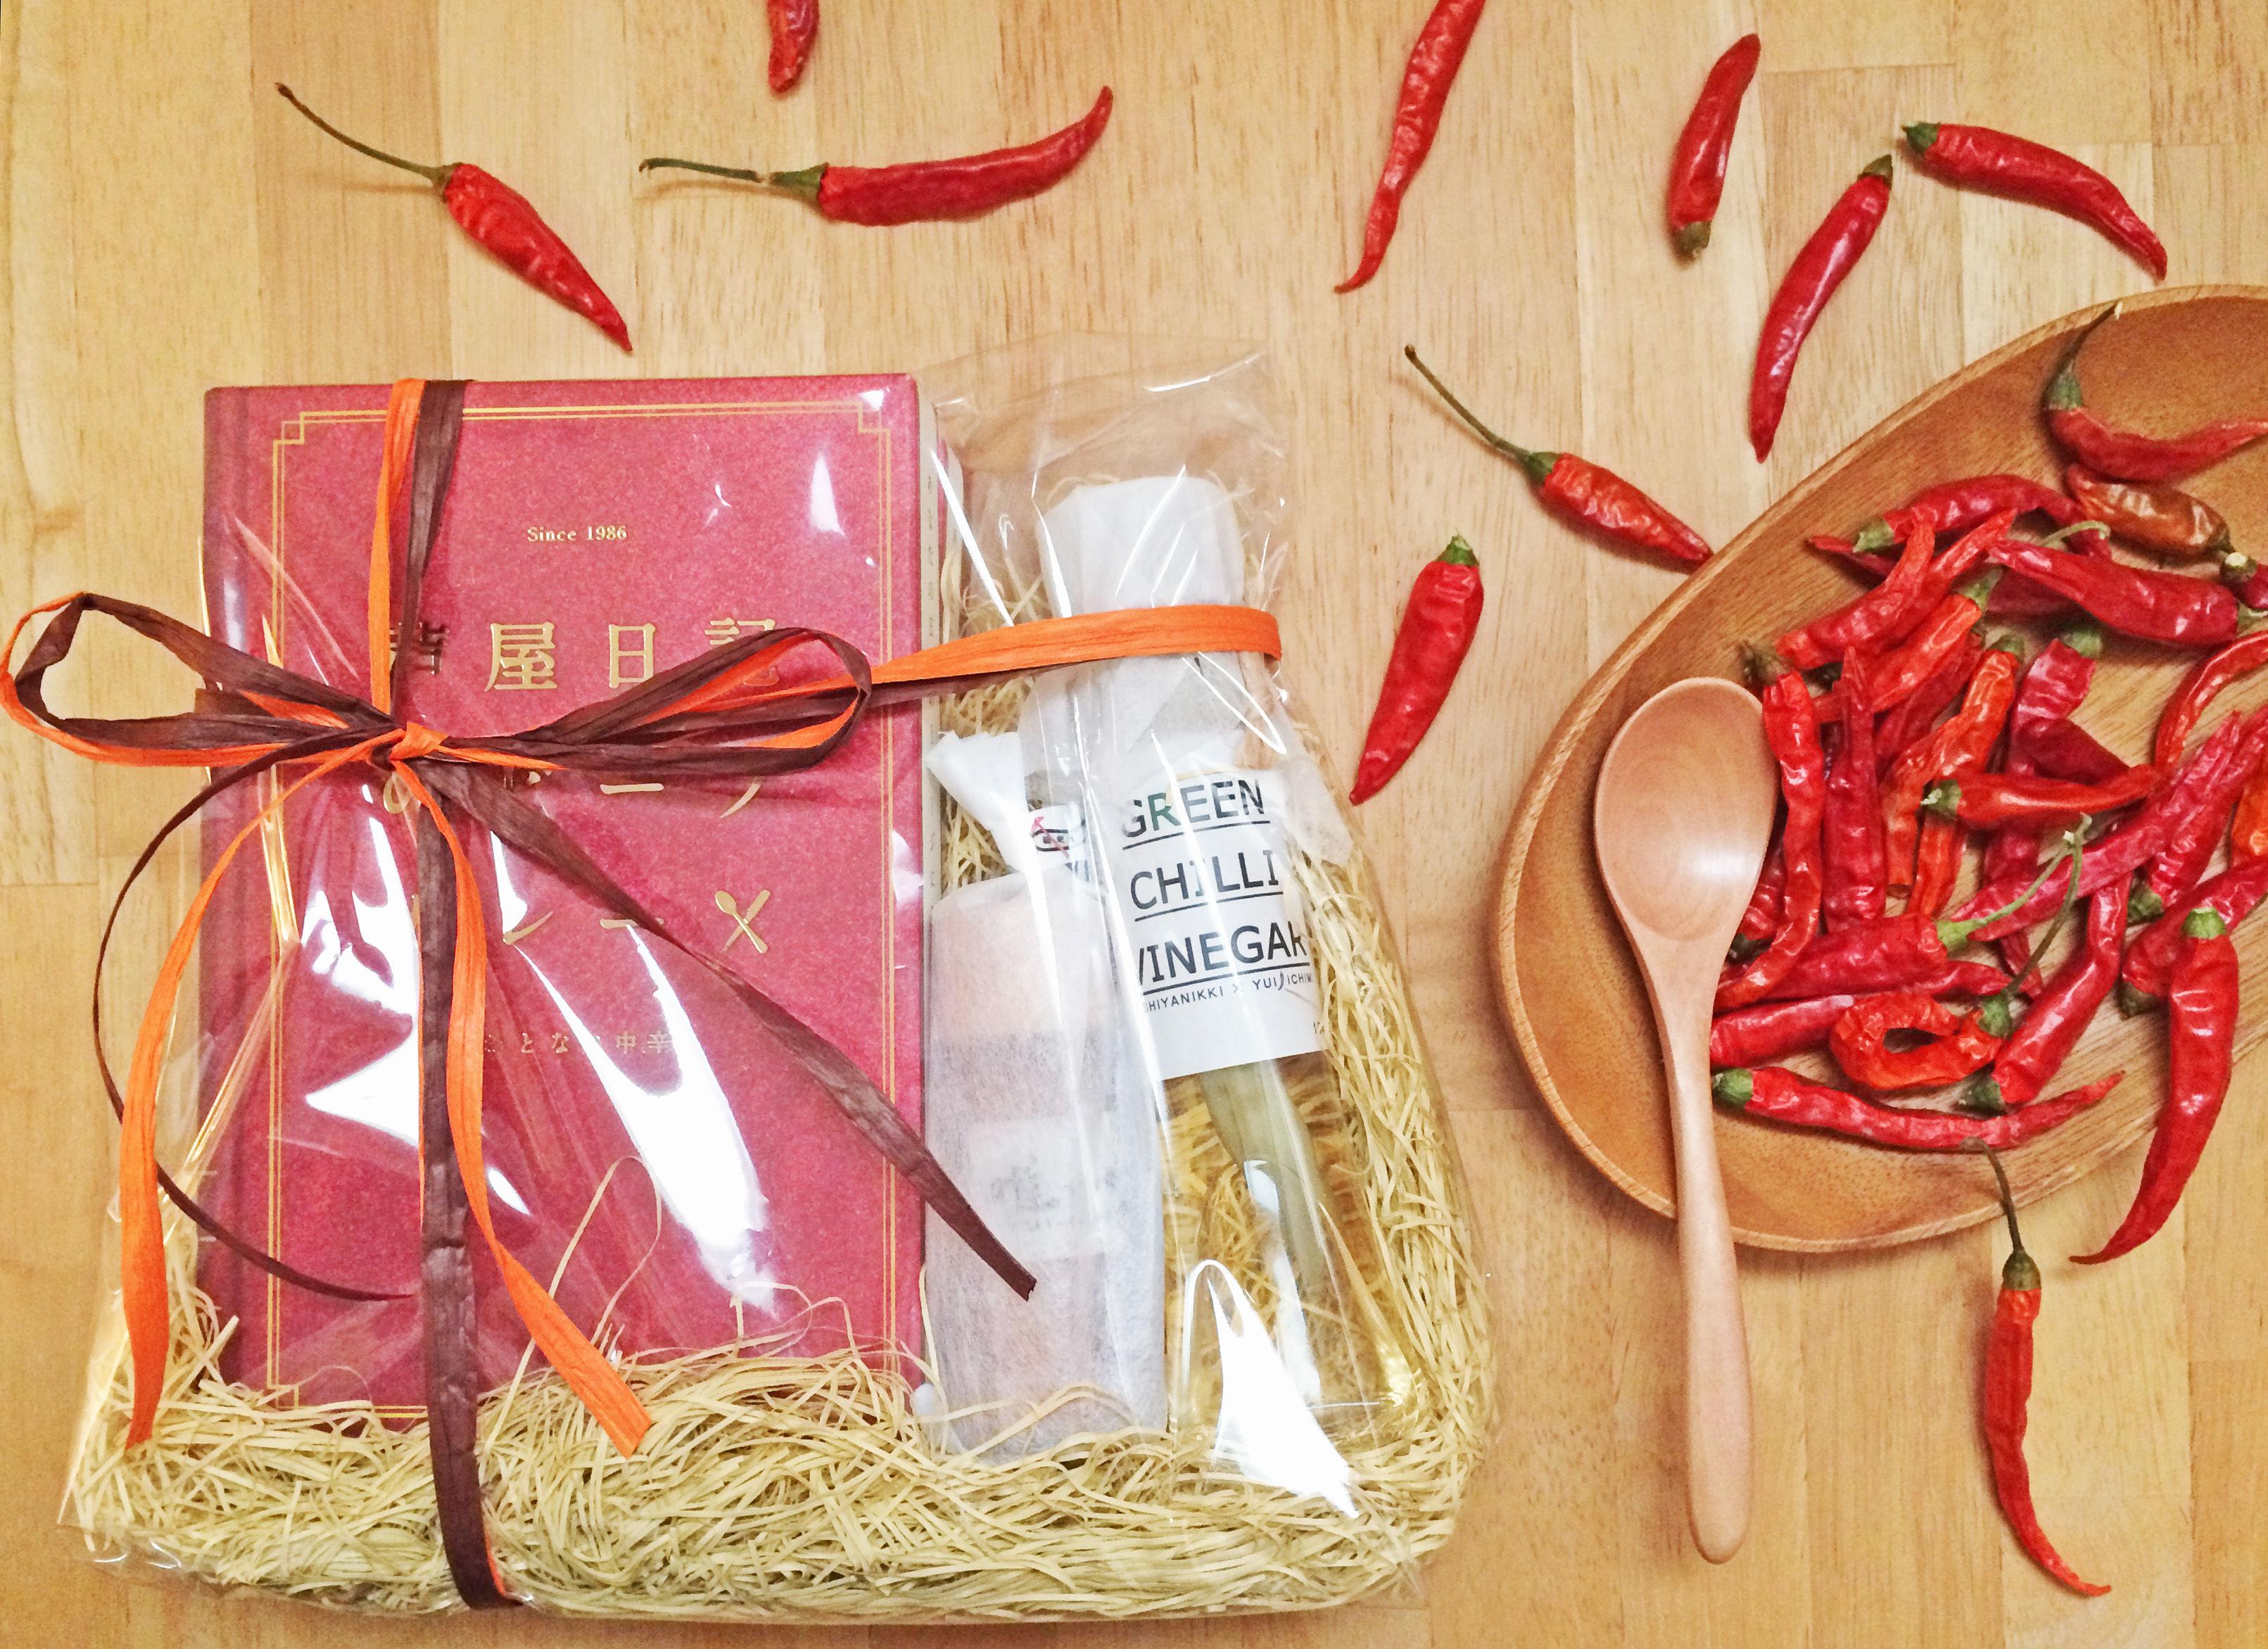 Gift set(唯一味 *選べる1本* +  カレーにかけるお酢 *選べる1本*  +  芦屋日記のビーフカレー<おとなの中辛>2食)